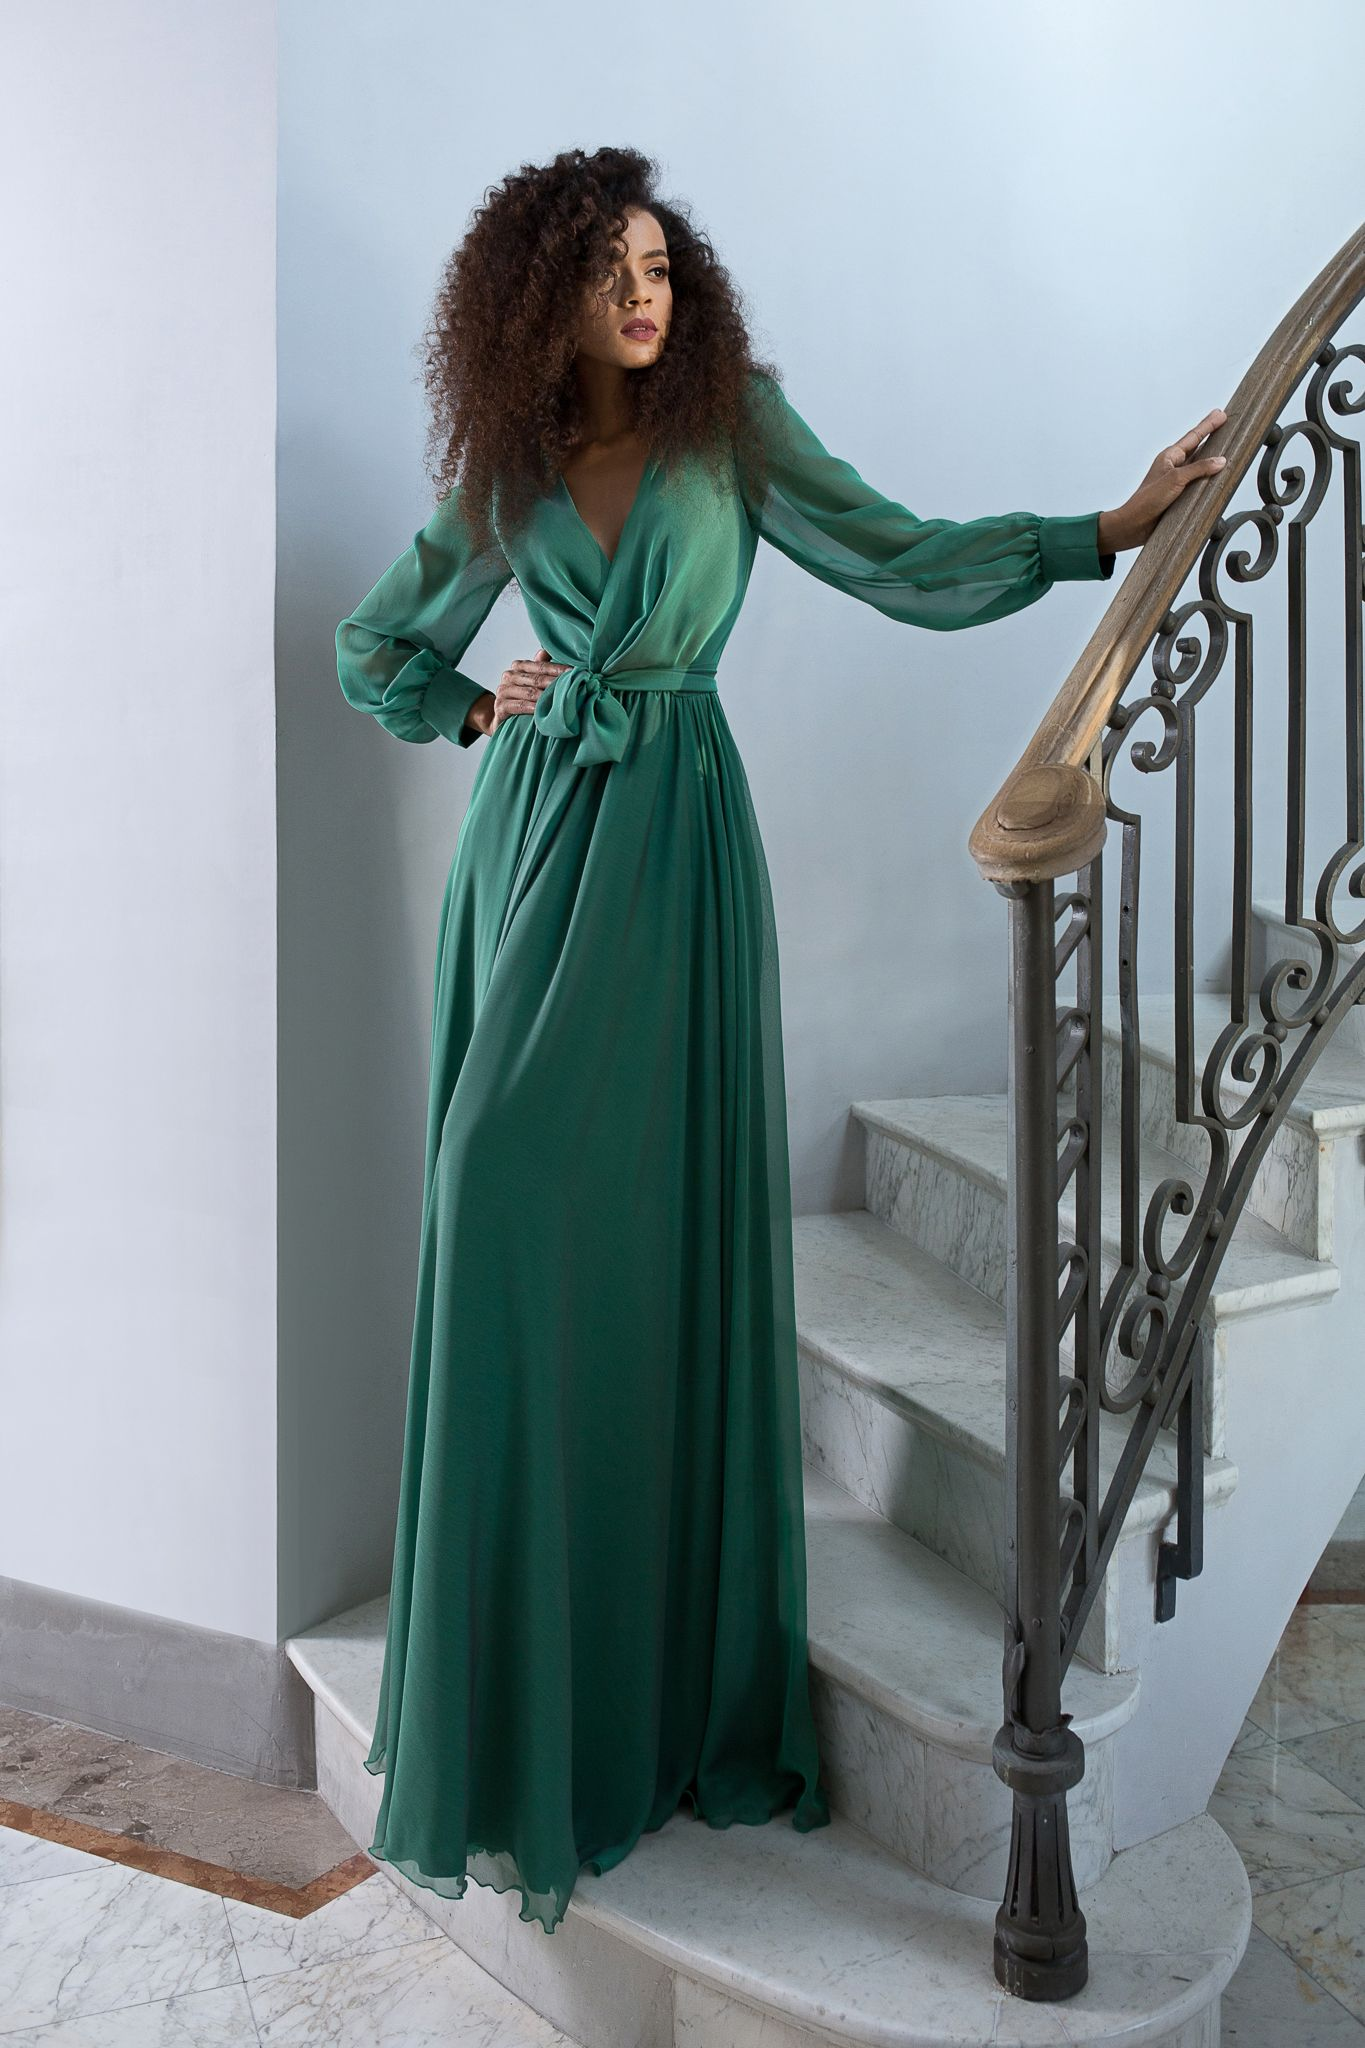 Emerald Green Silk Dress With Bishop Sleeves Maigre Couture Green Silk Dresses Green Long Sleeve Dress Maxi Dress Green